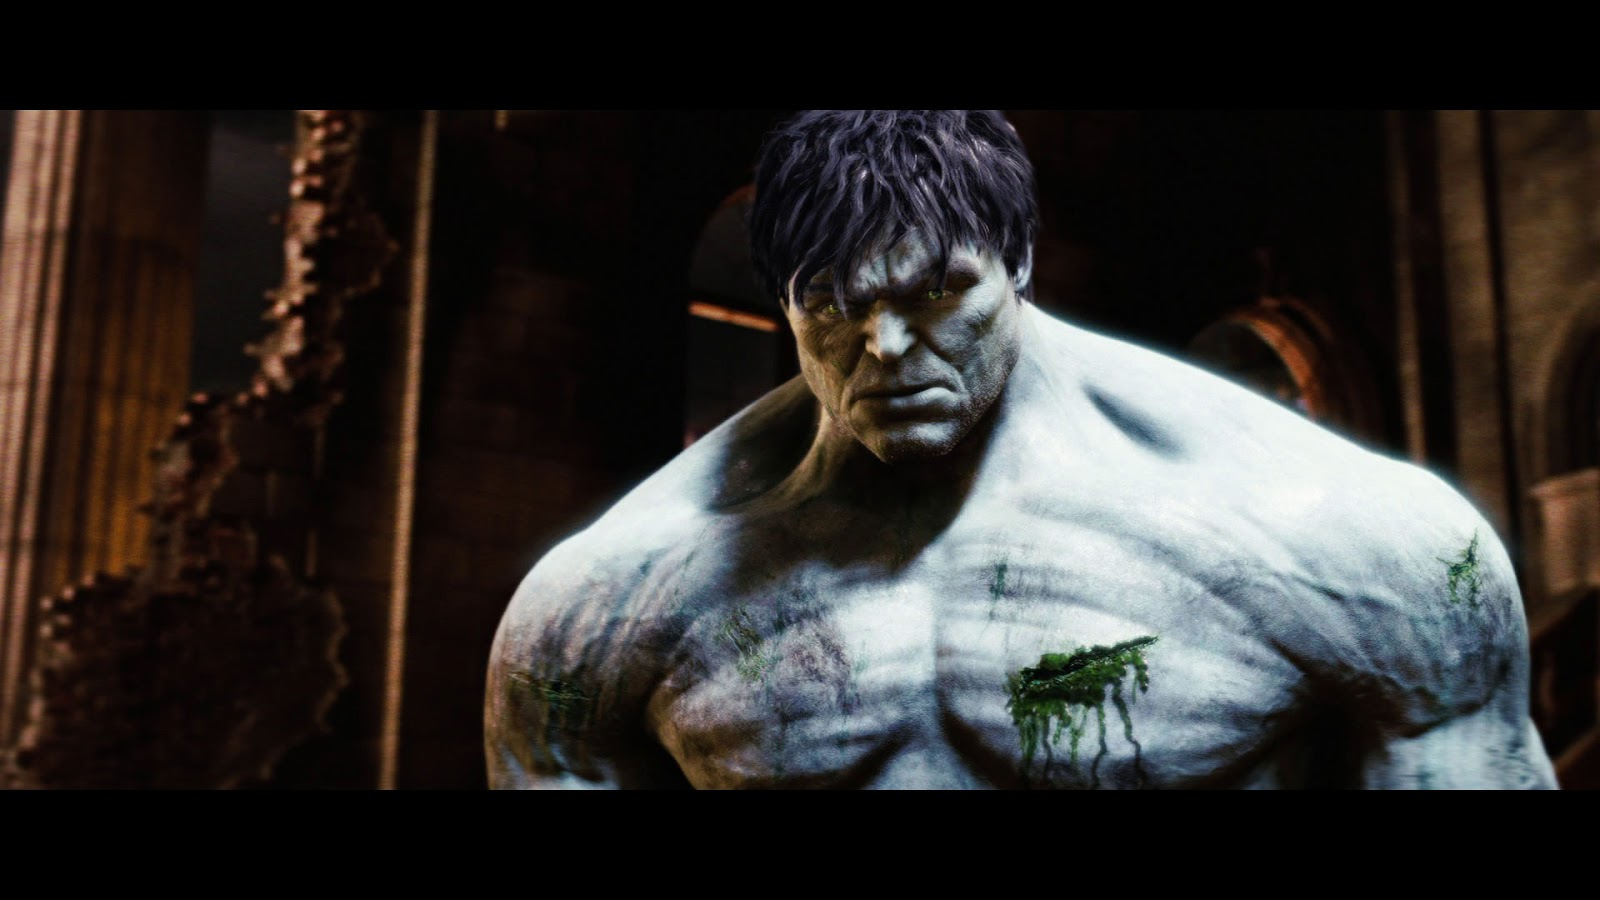 Download Hd Wallpapers Of Hulk Bantaizone